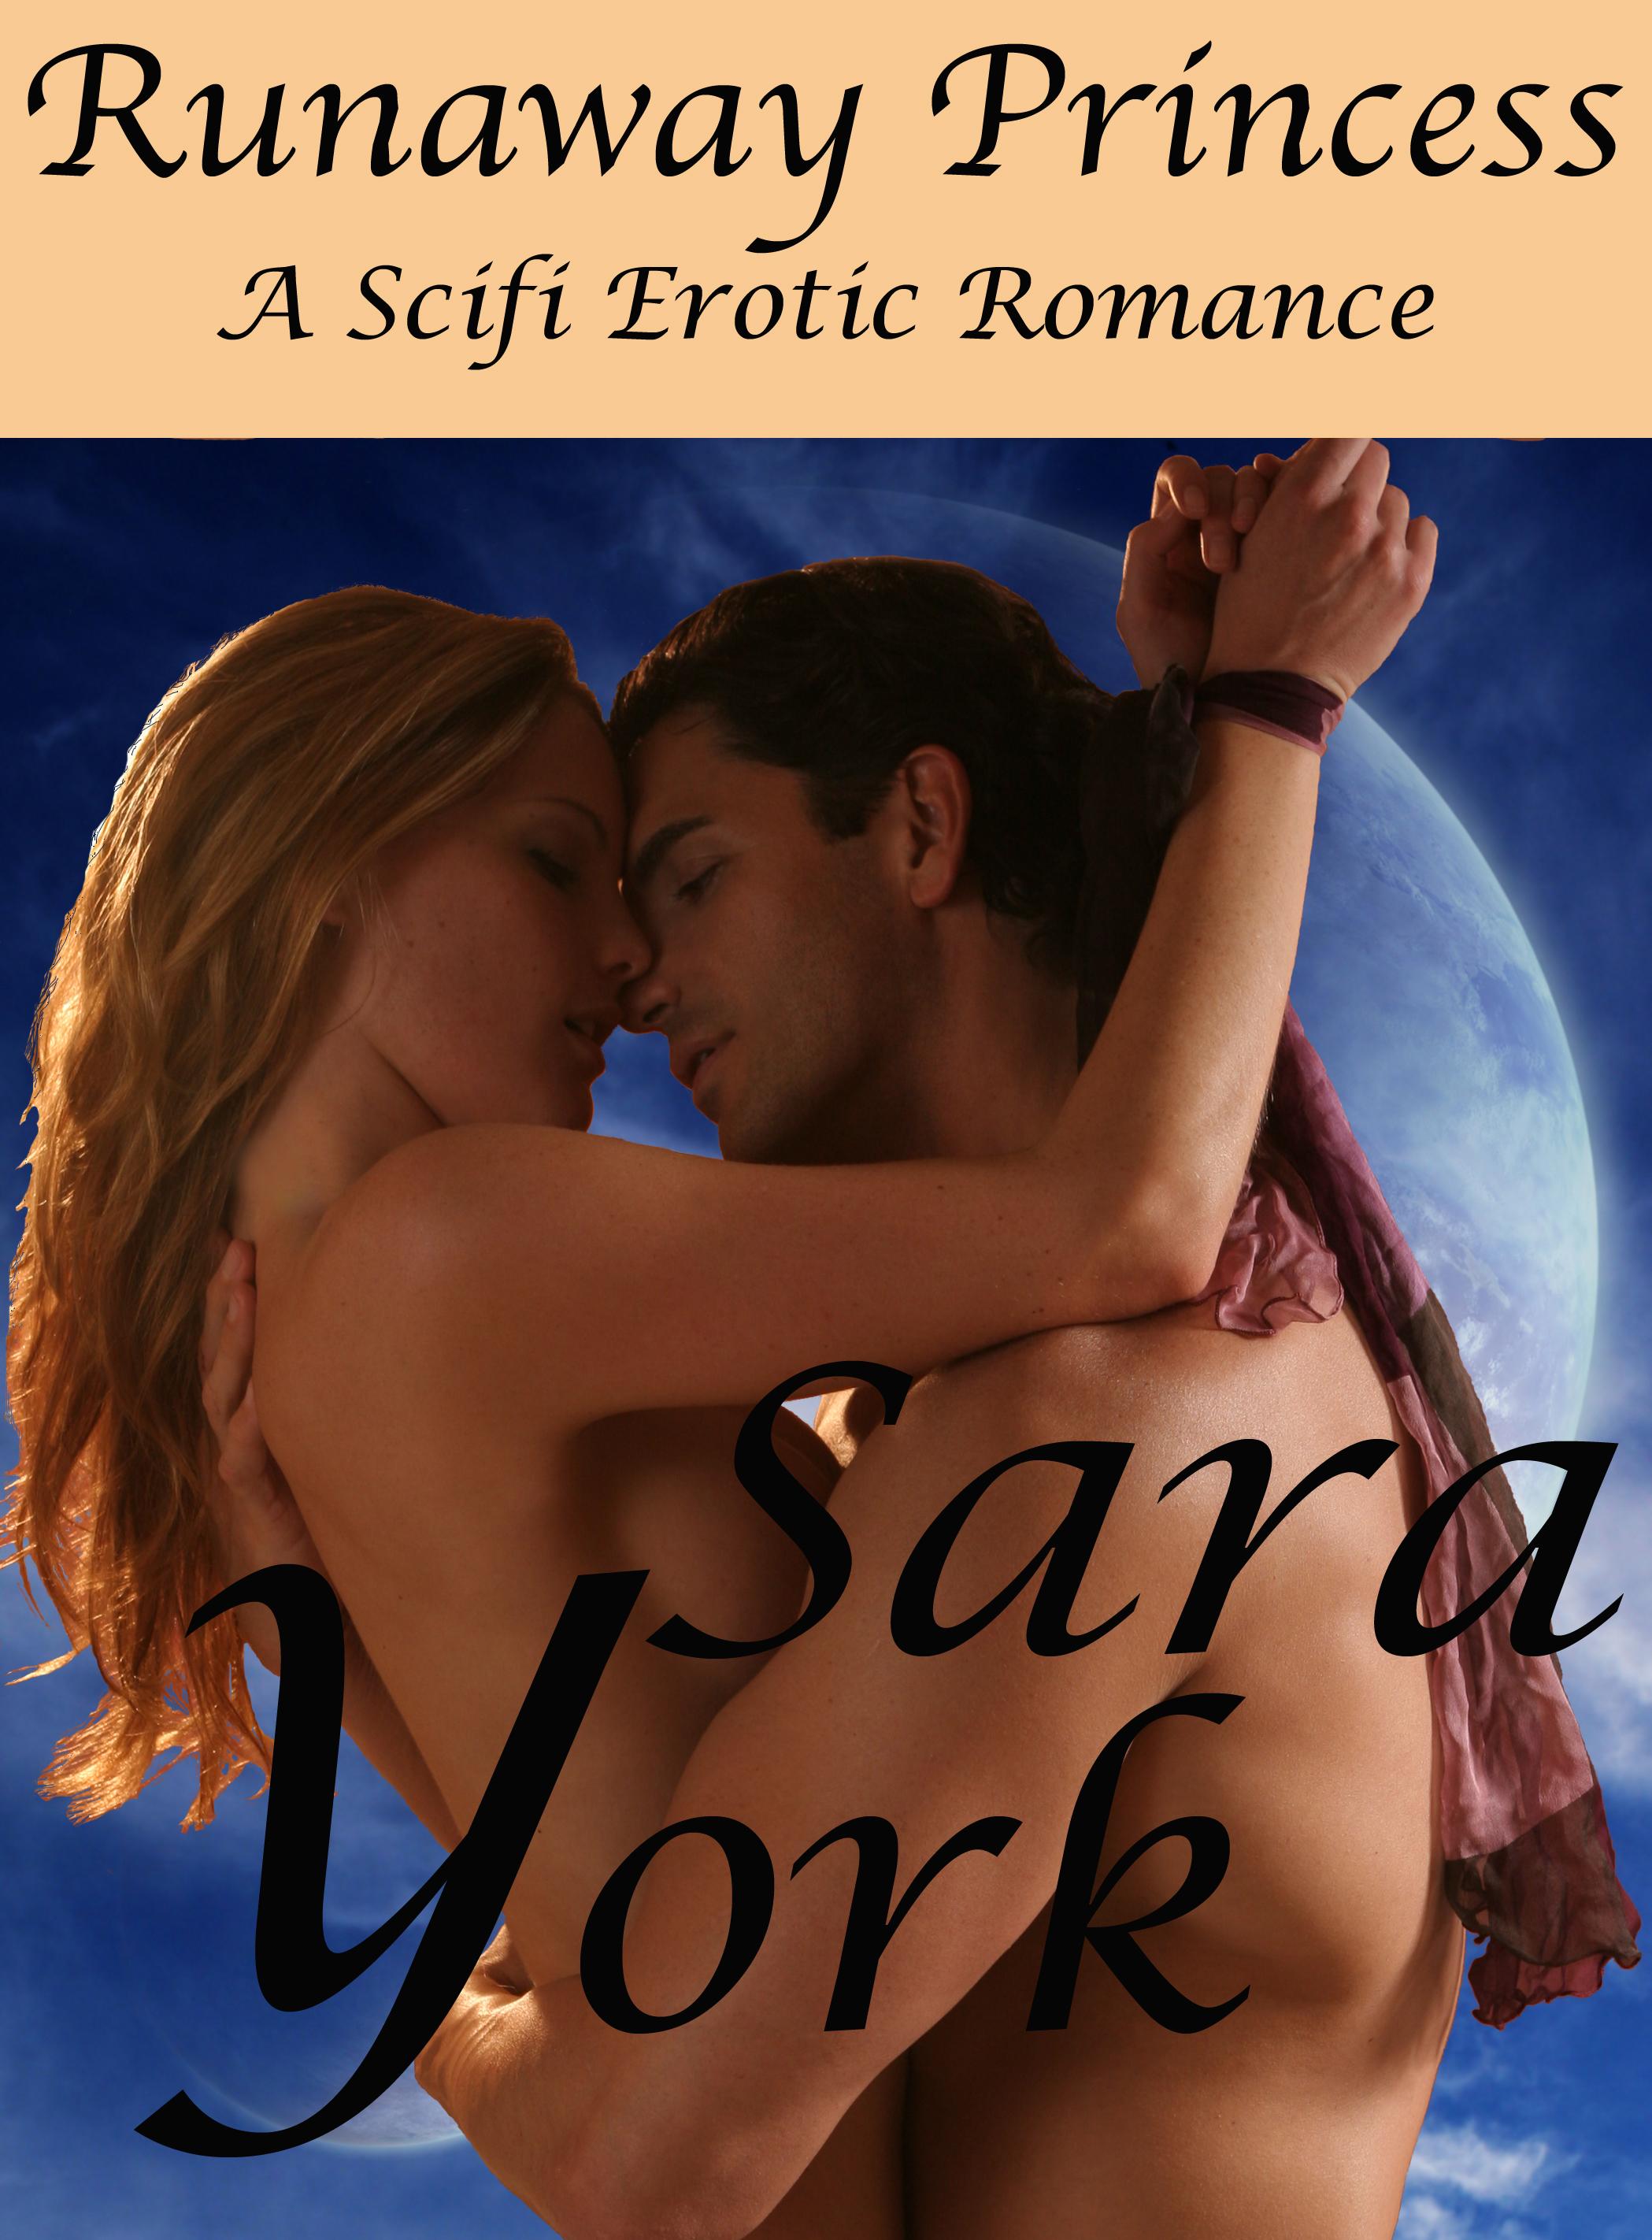 Sara York - Runaway Princess